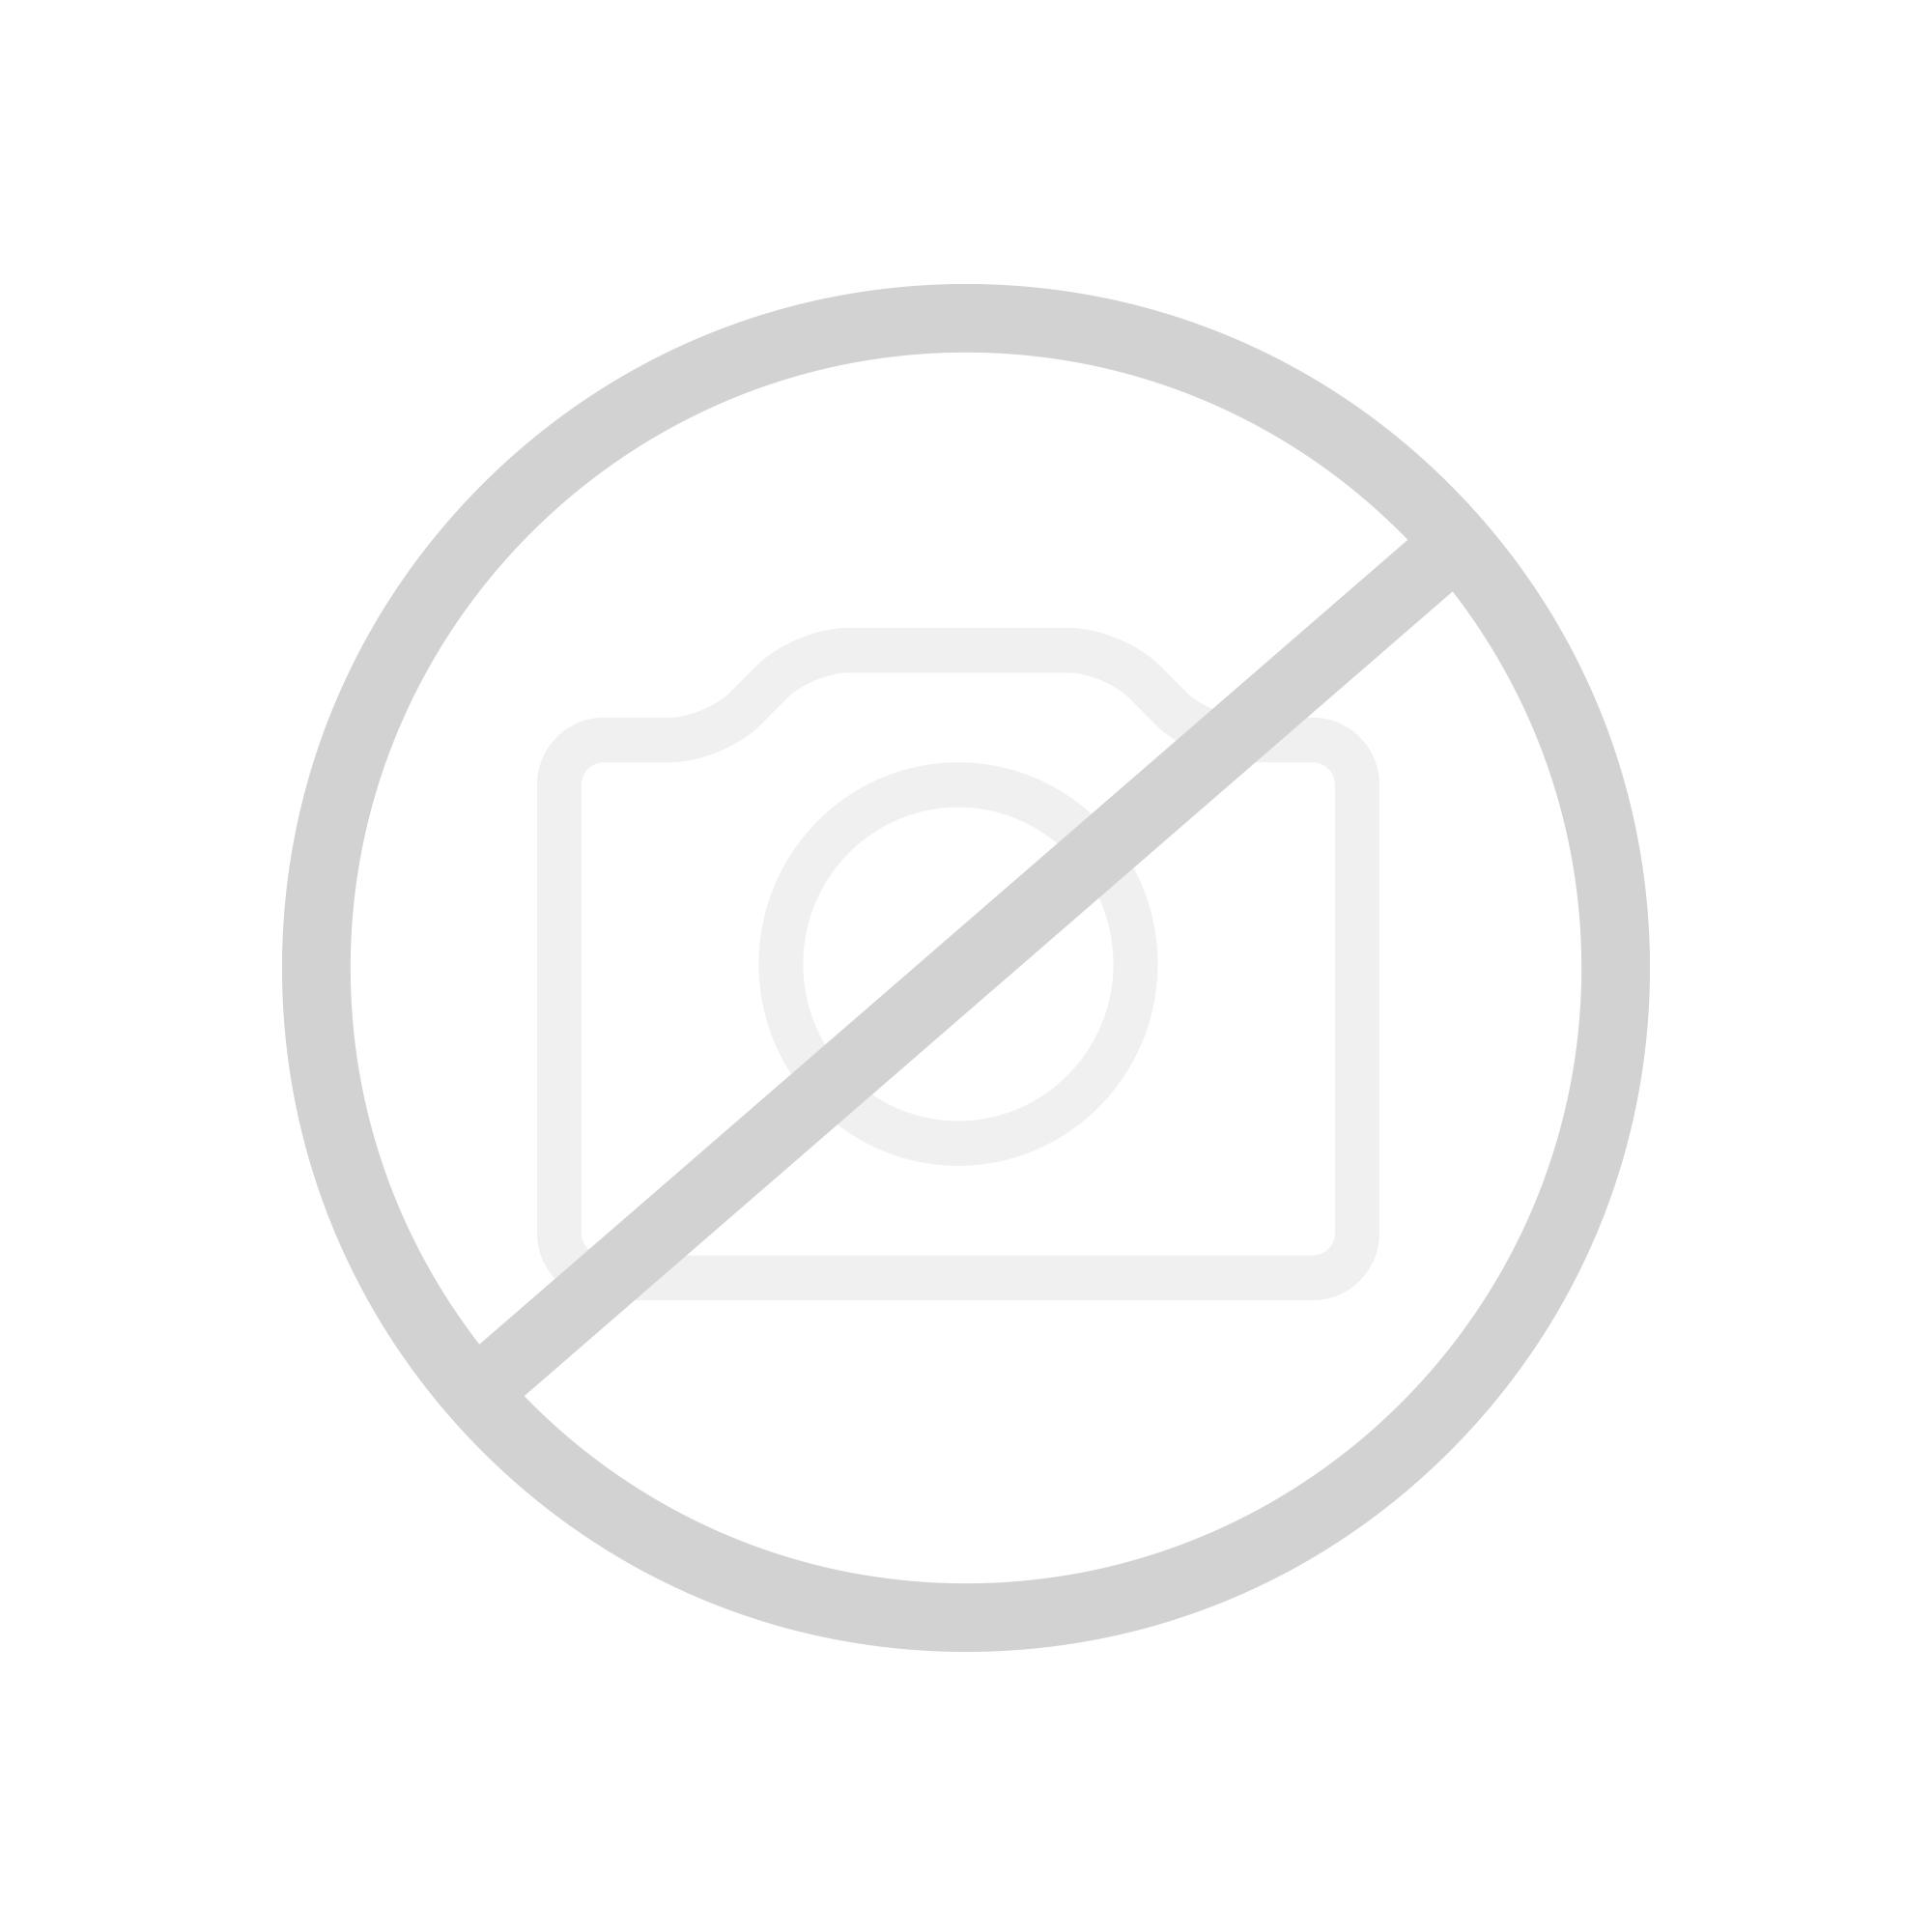 Geberit AquaClean 5000plus Dusch-WC-Sitz weiß